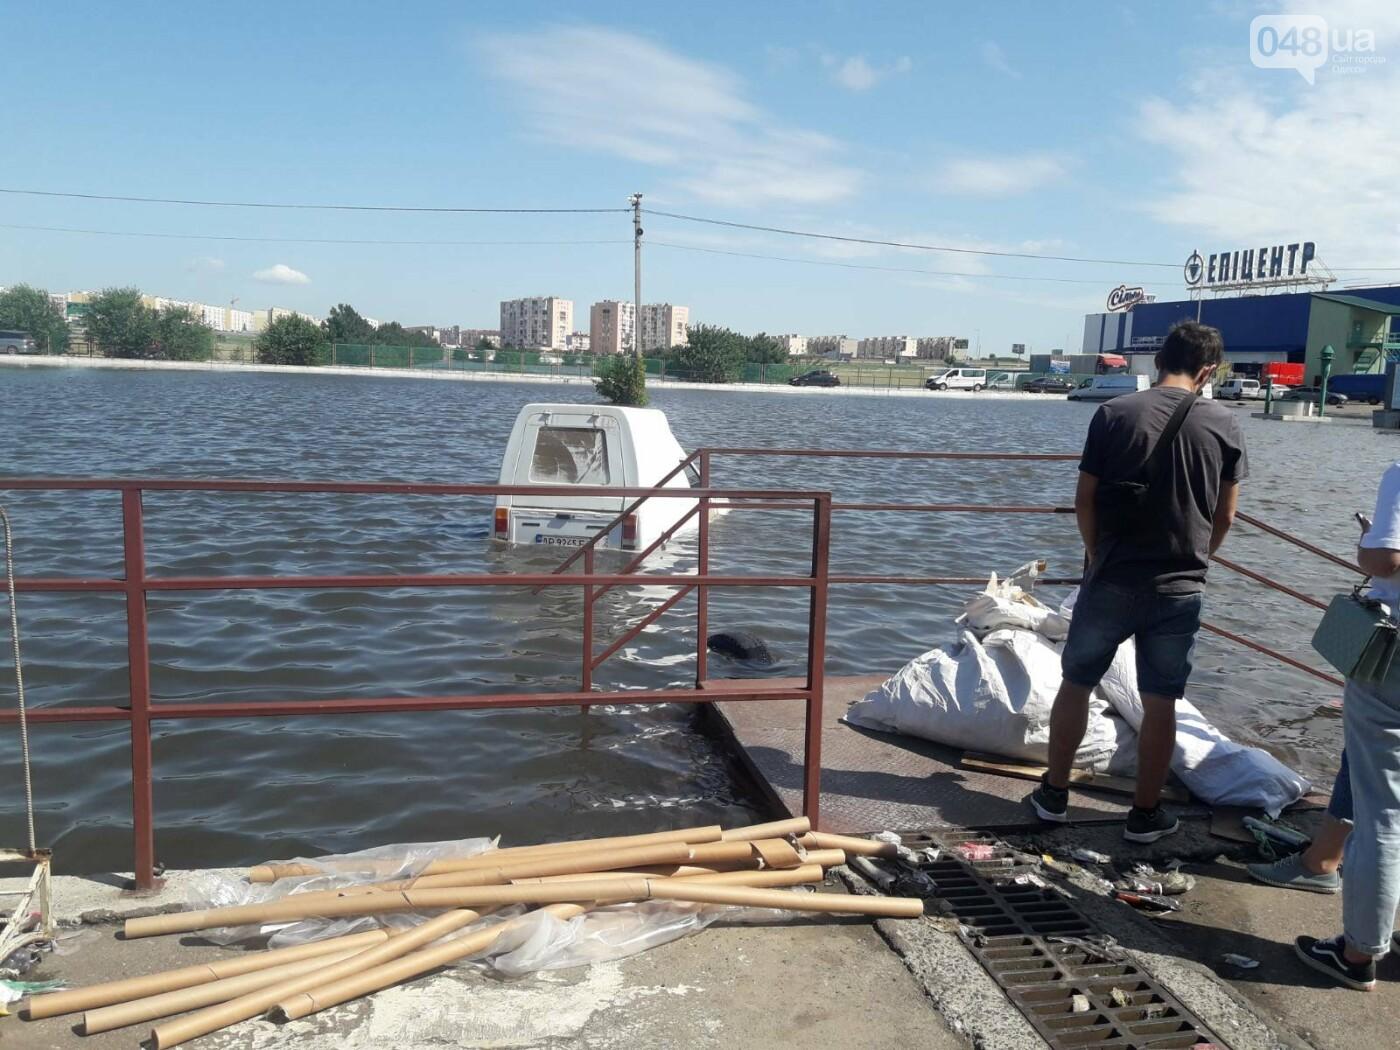 На промрынке 7км в Одессе образовалось море, - ФОТО, фото-14